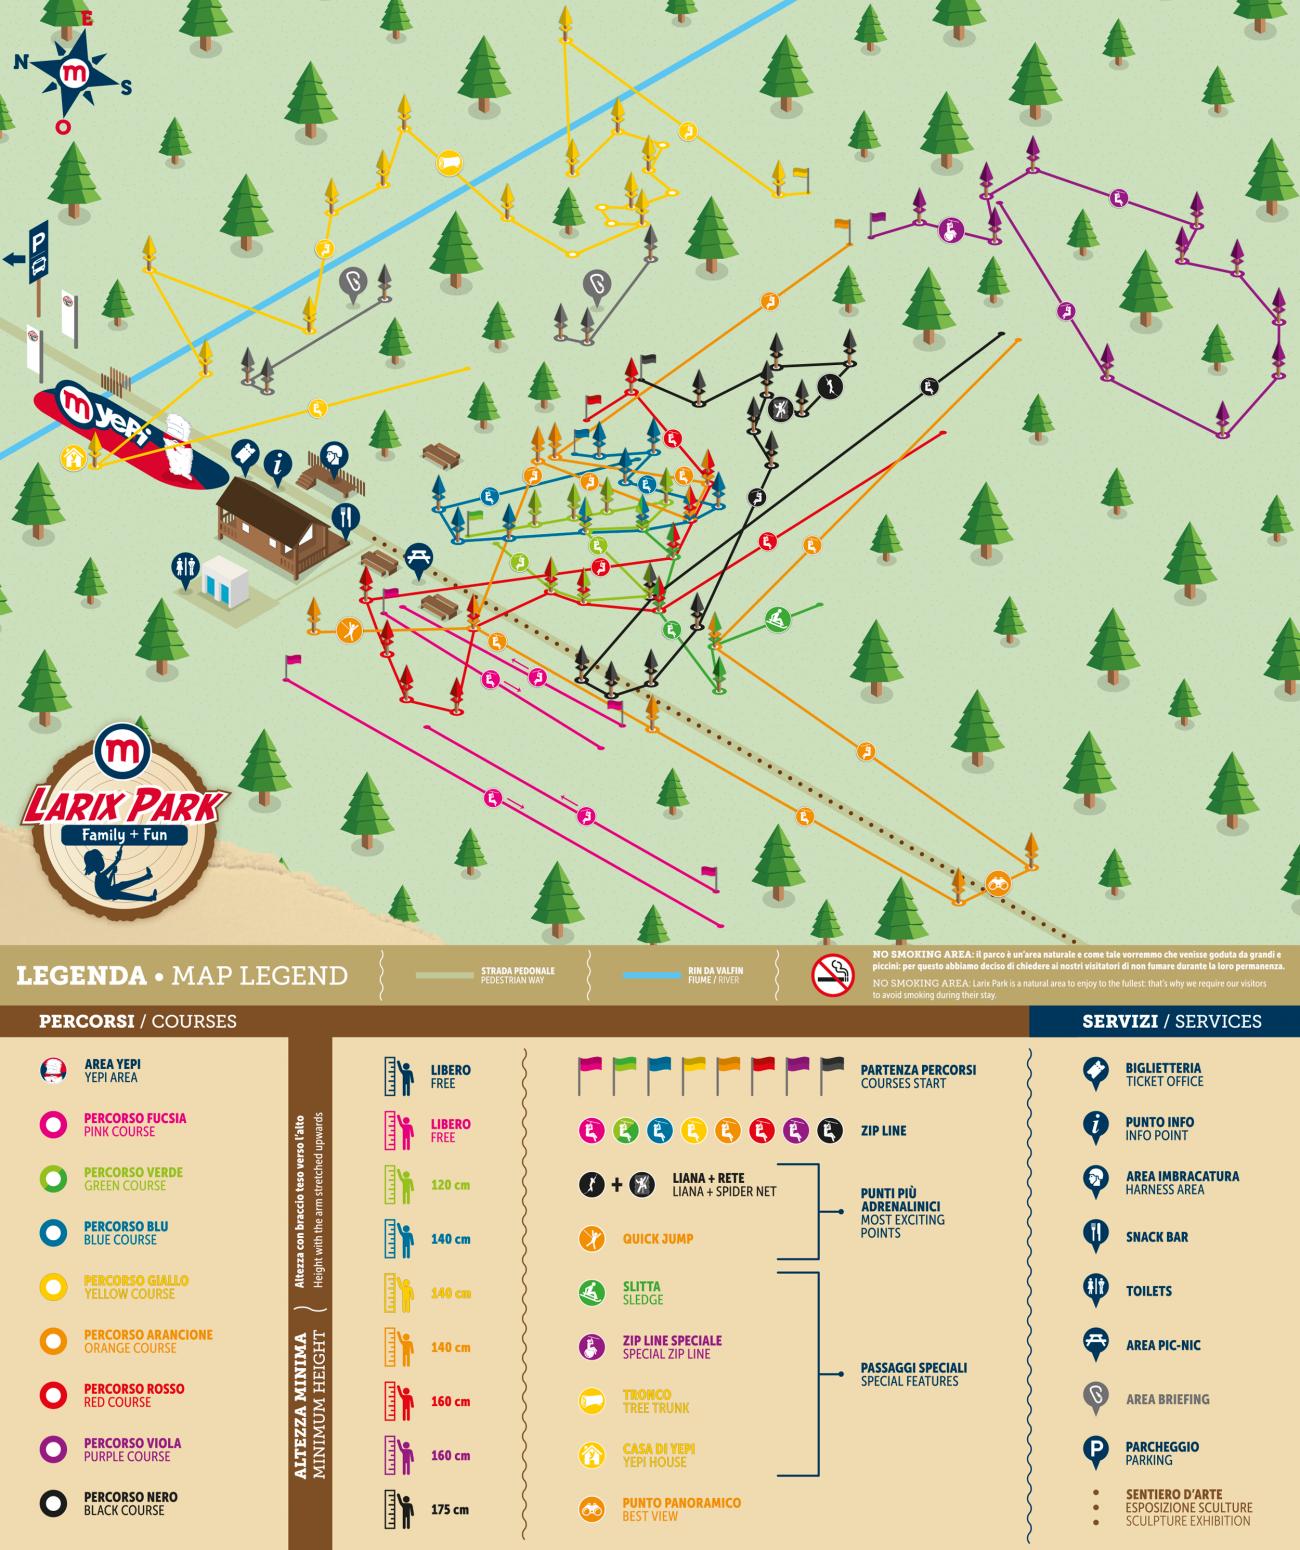 MOT-Mappa_LarixPark_Mottolino